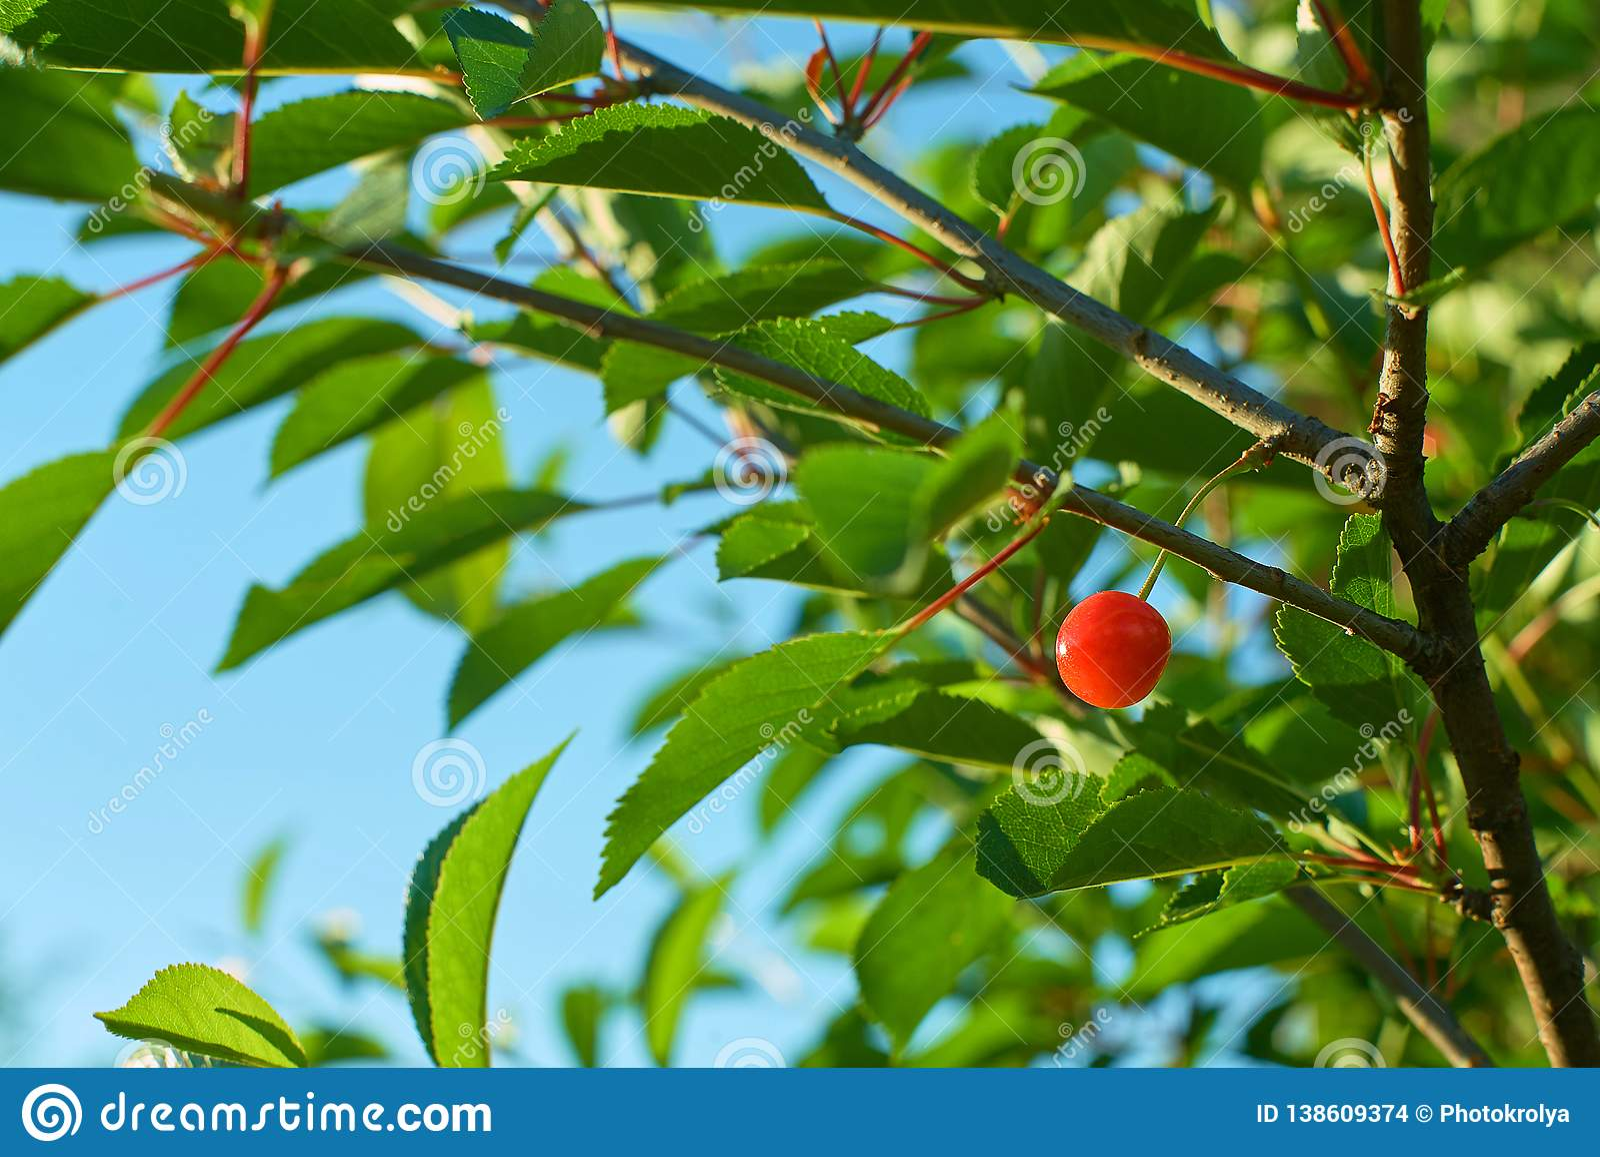 Single ripe cherry fruit hanging on branch.